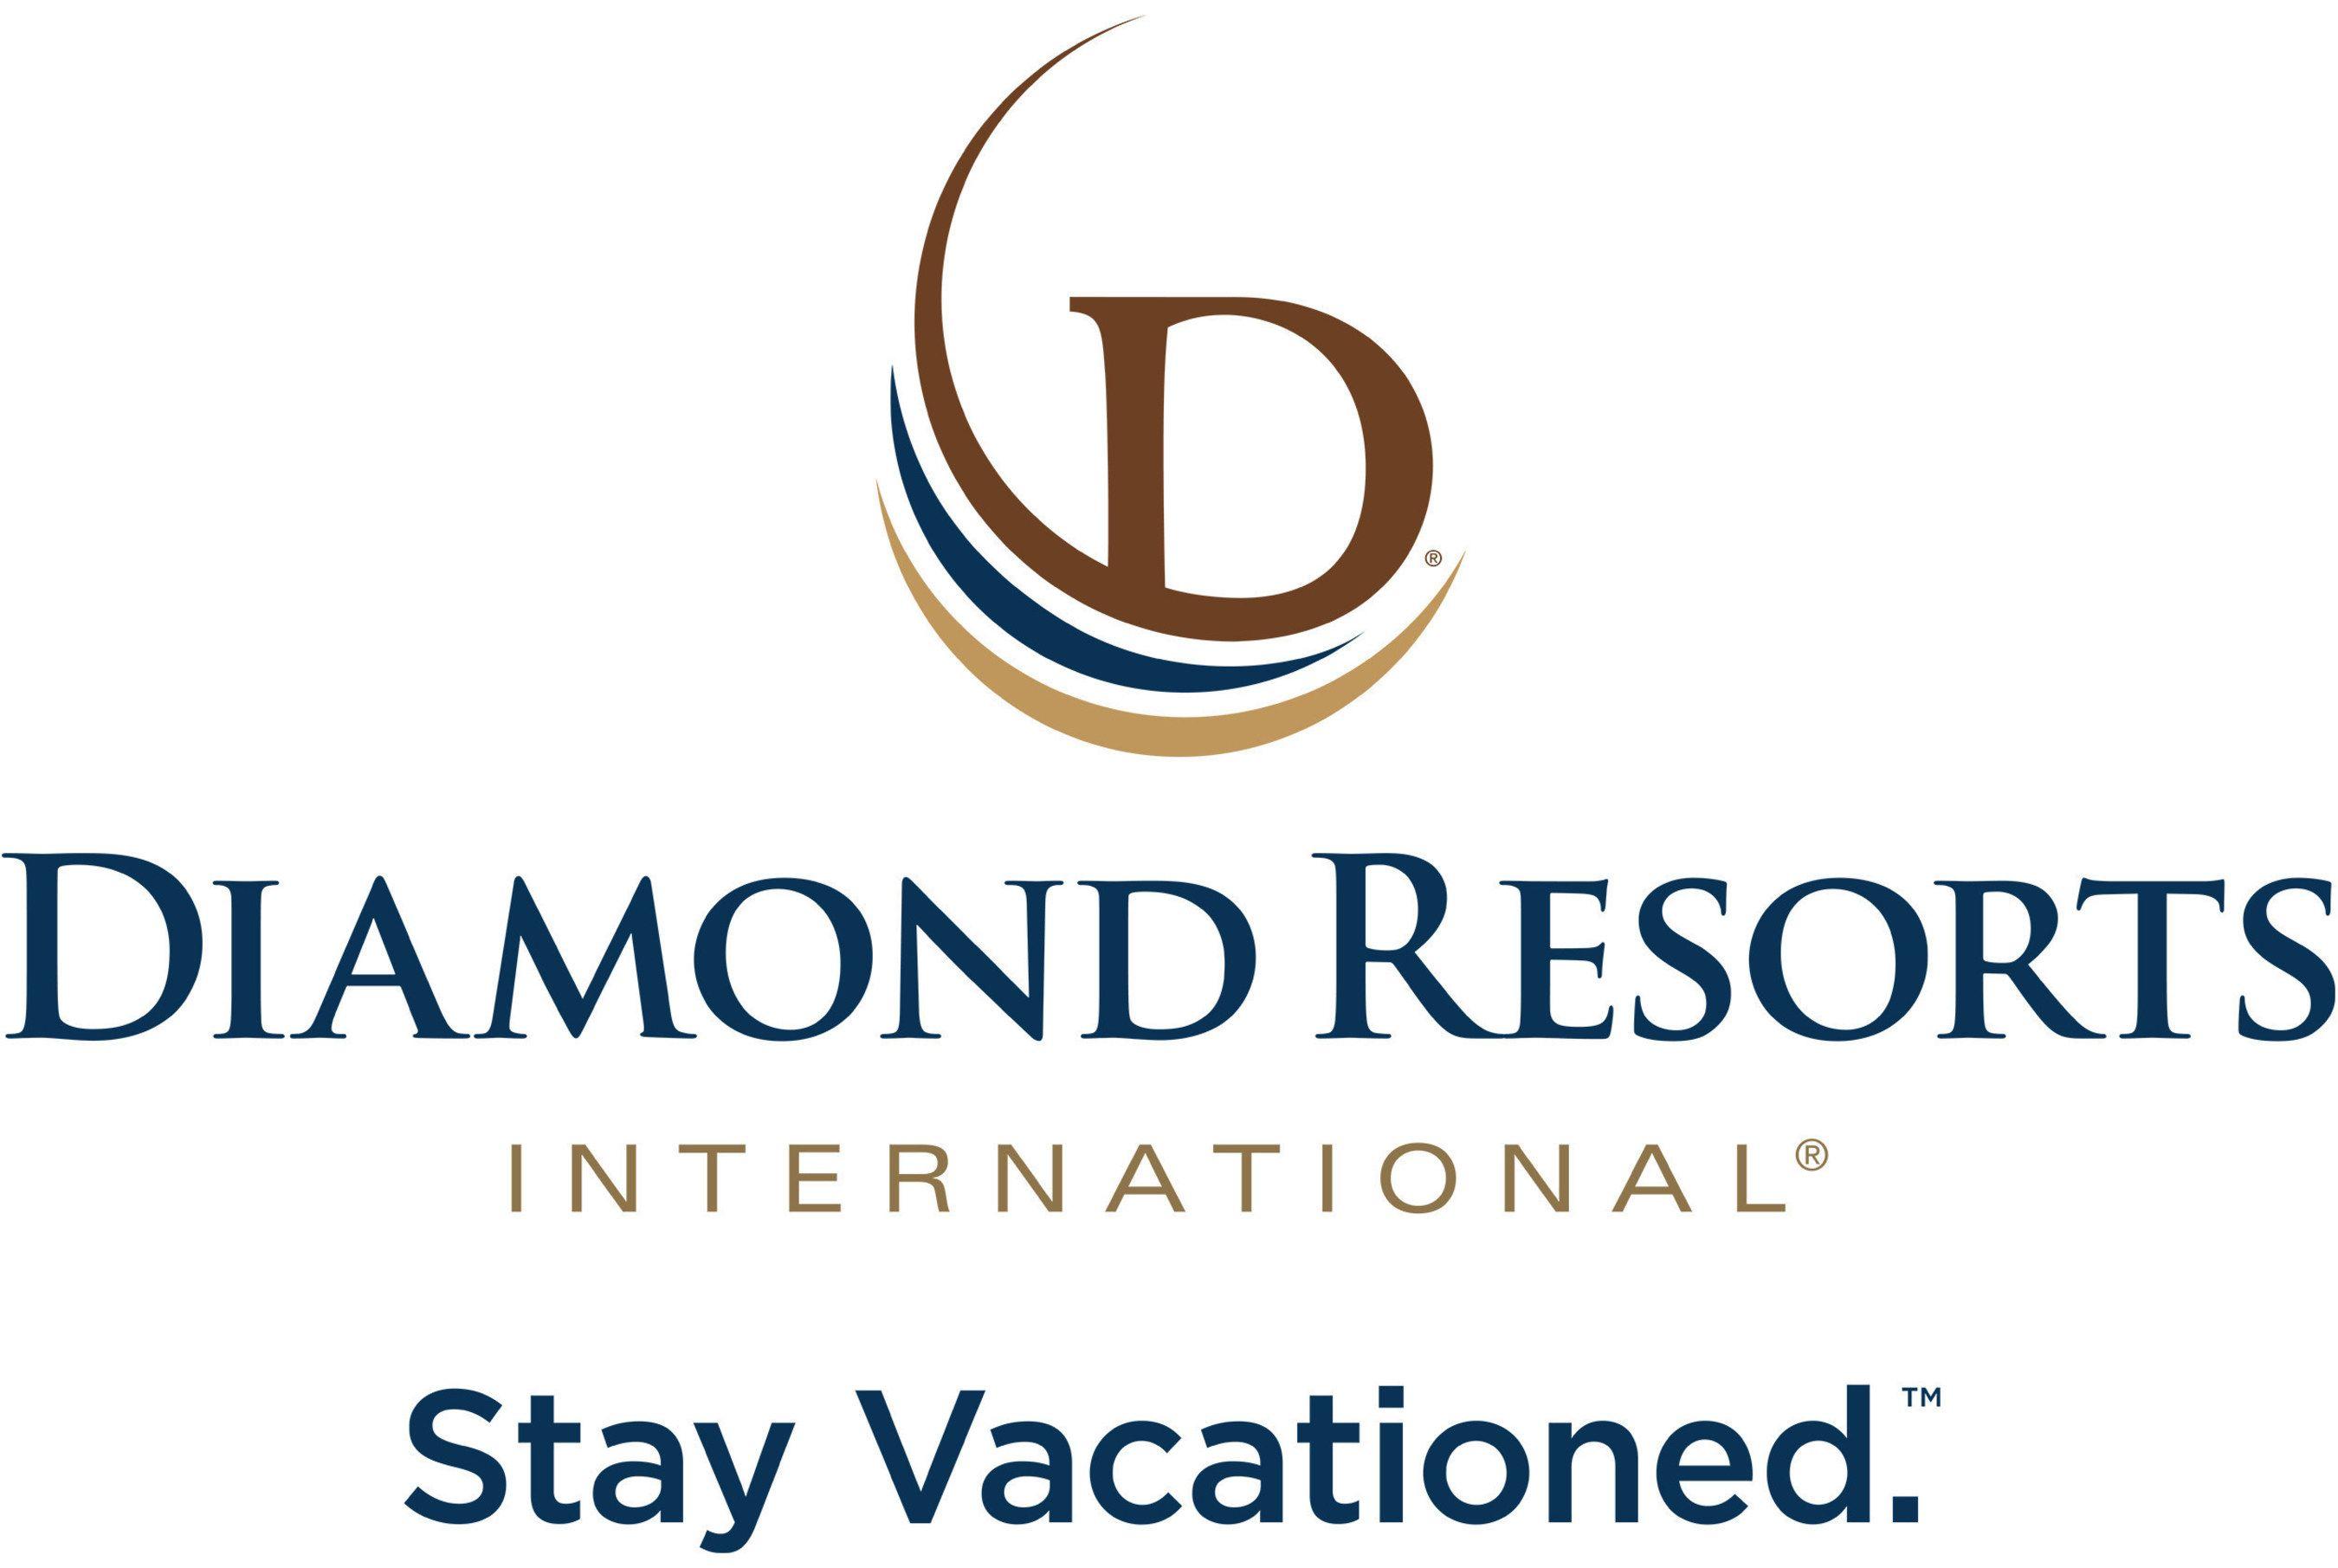 Diamond Resorts International Marketing At Summer Engagement